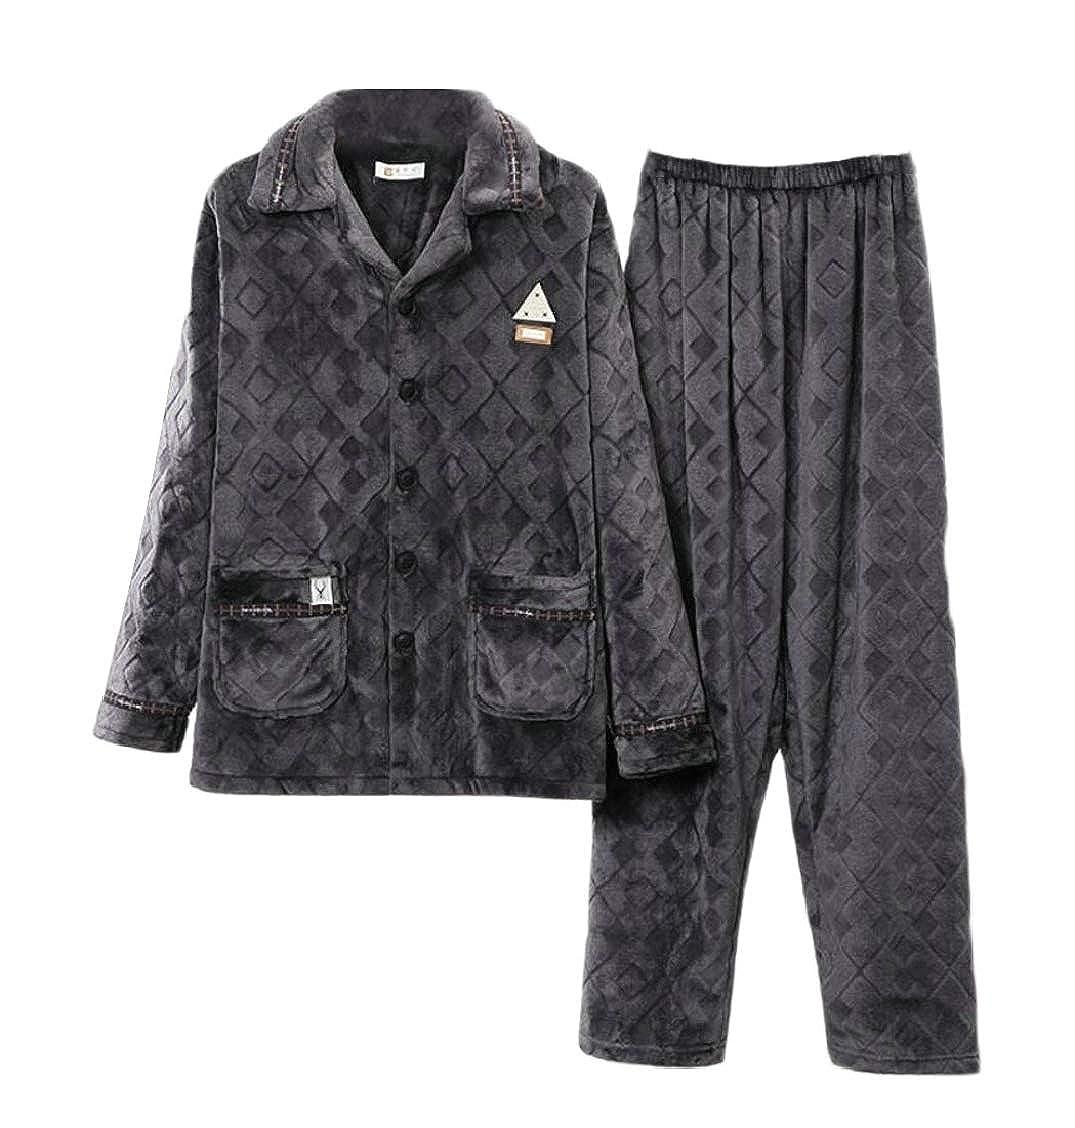 XQS Mens Comfy Winter Warm Flannel Thicken Solid Color Pajamas Set